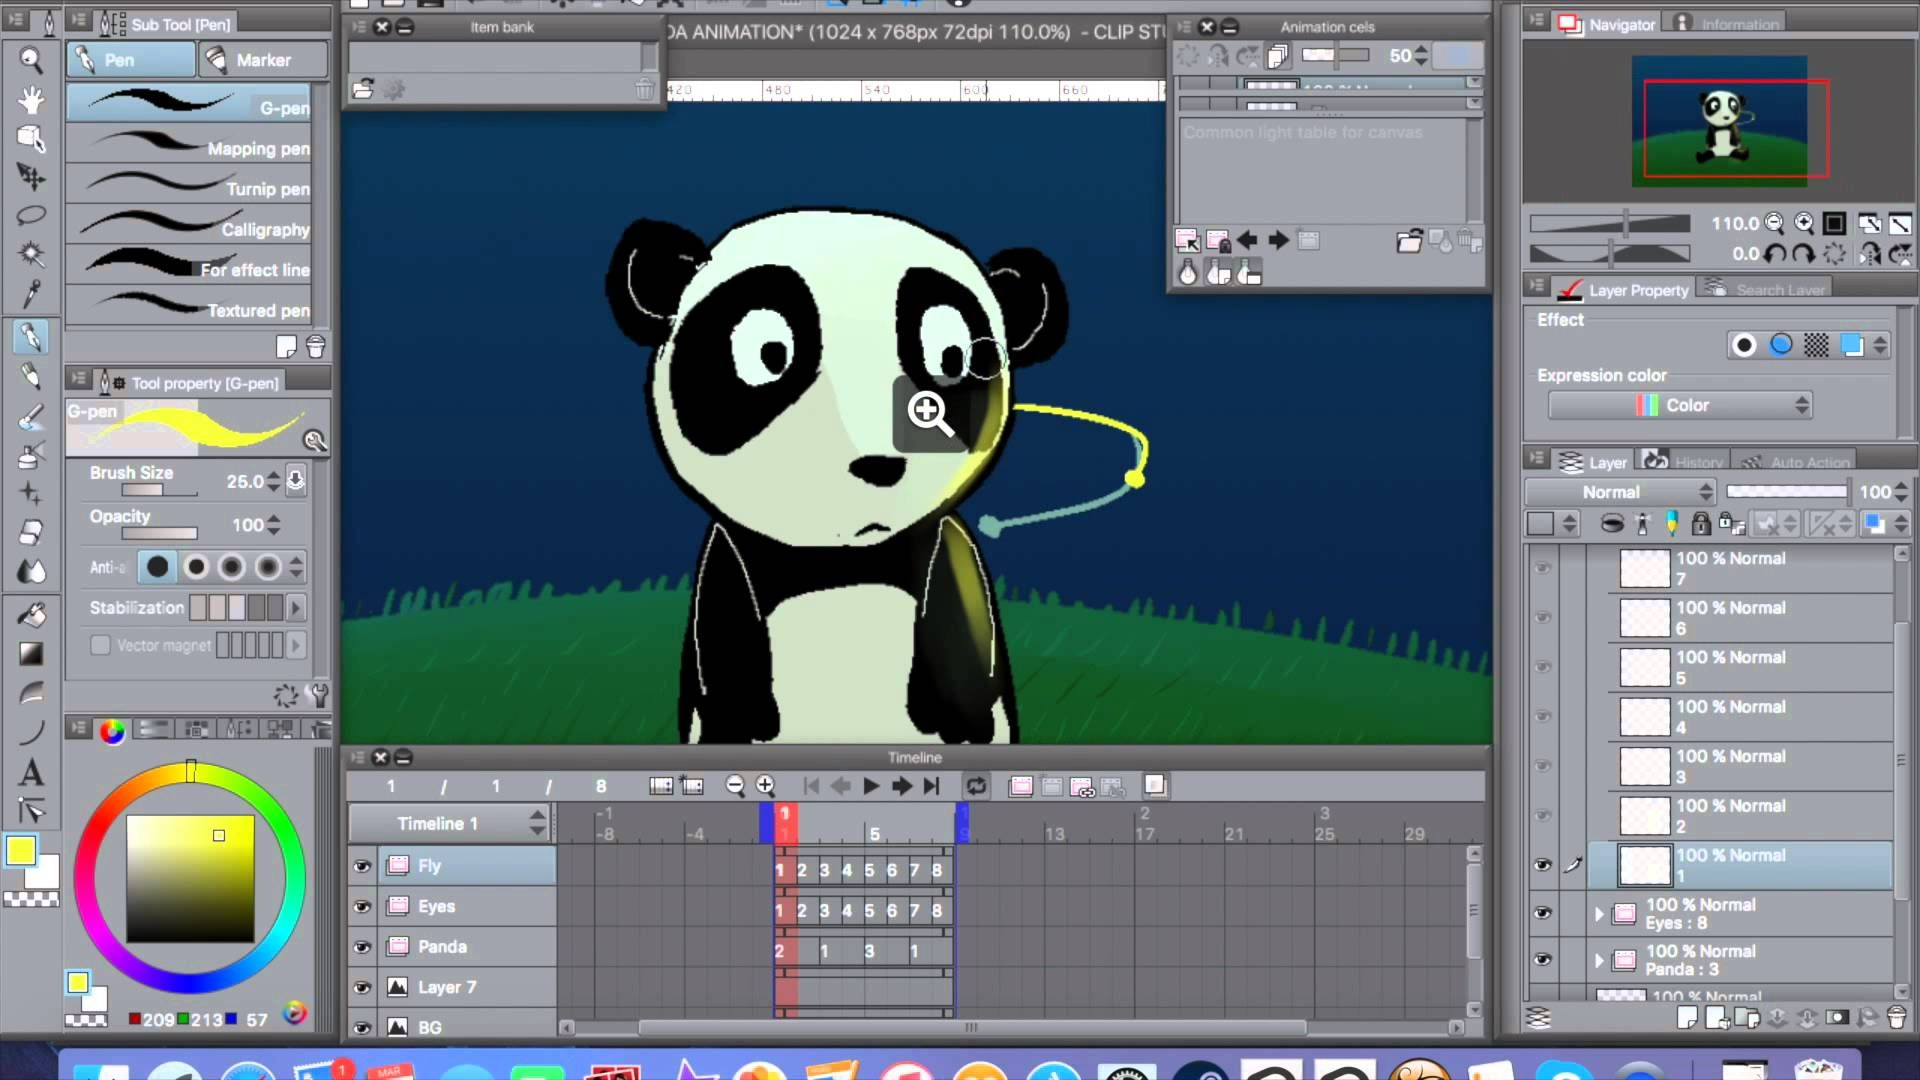 planungsprogramm freeware website pic und dfbdddfbbdbabc jpg